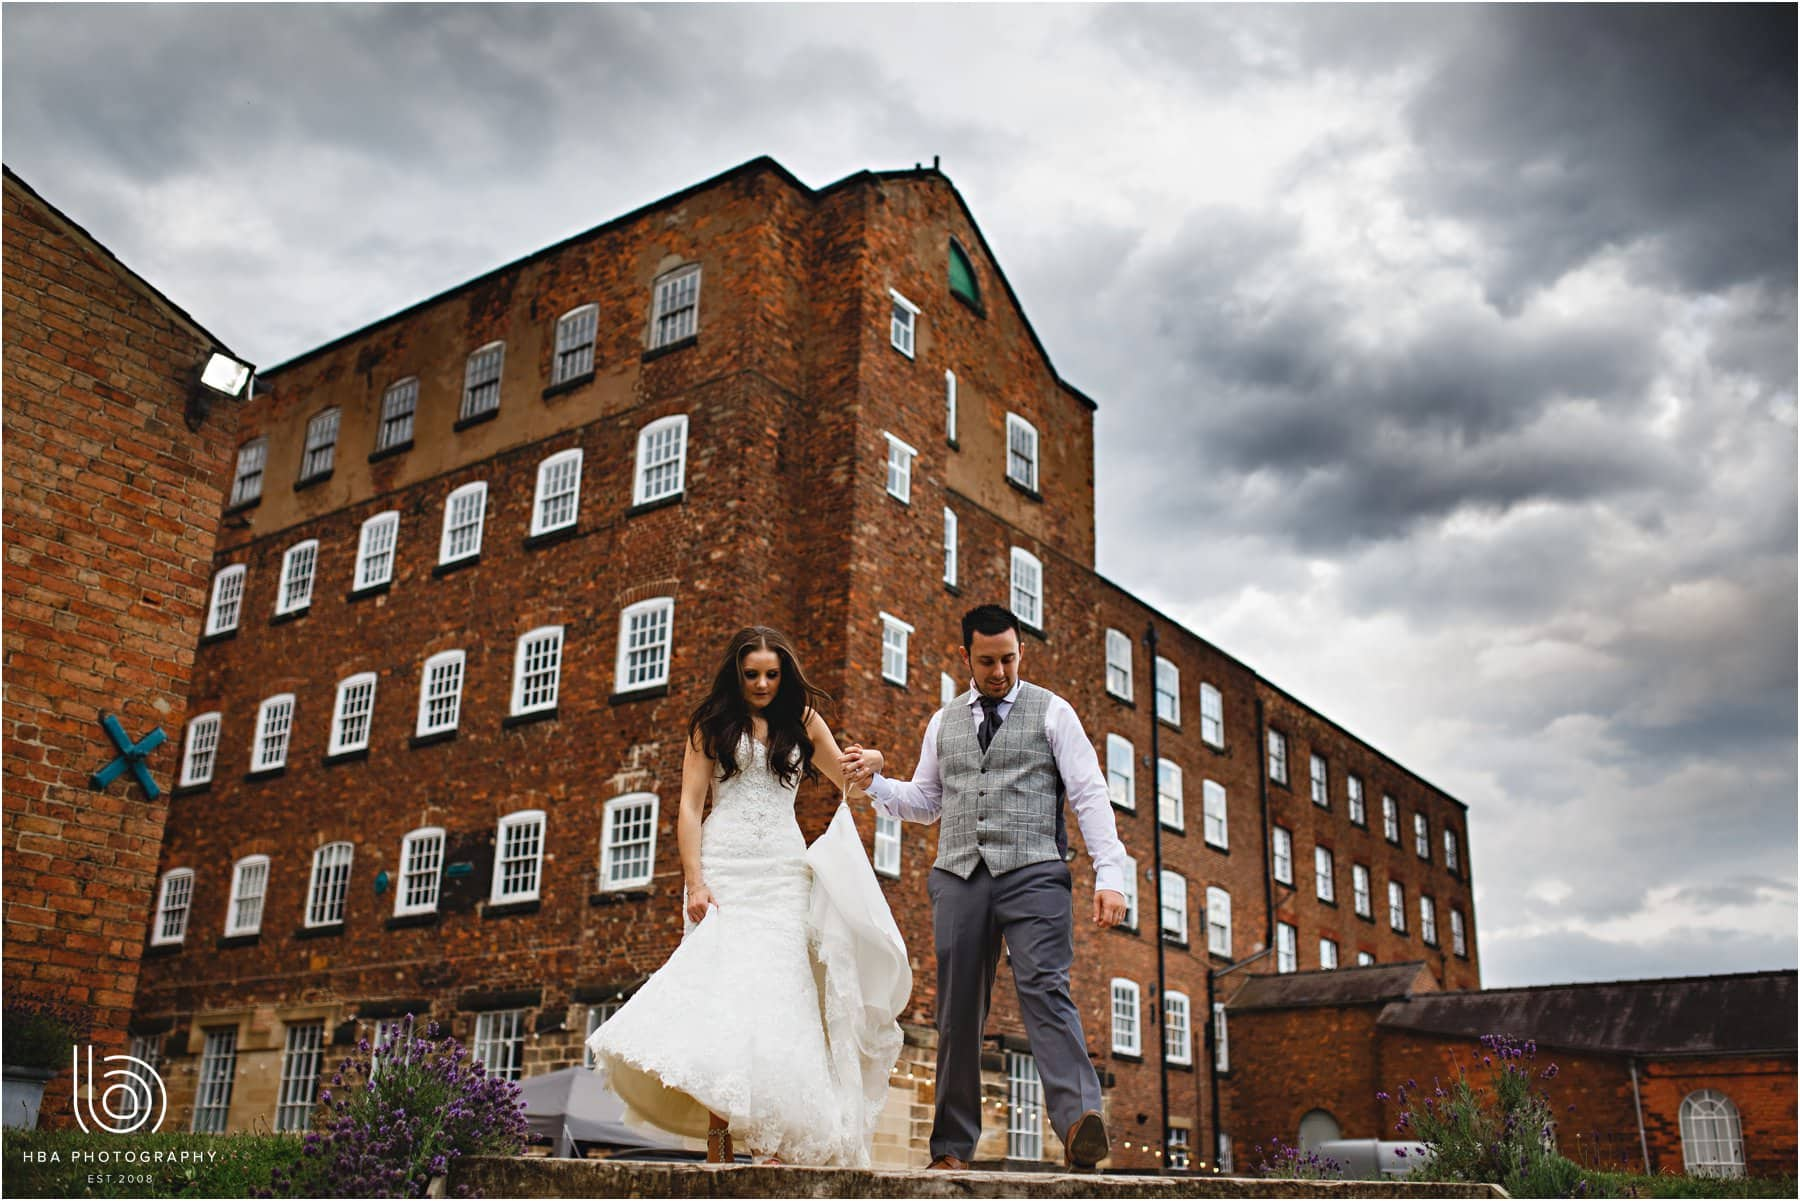 the bride & groom walking down the steps